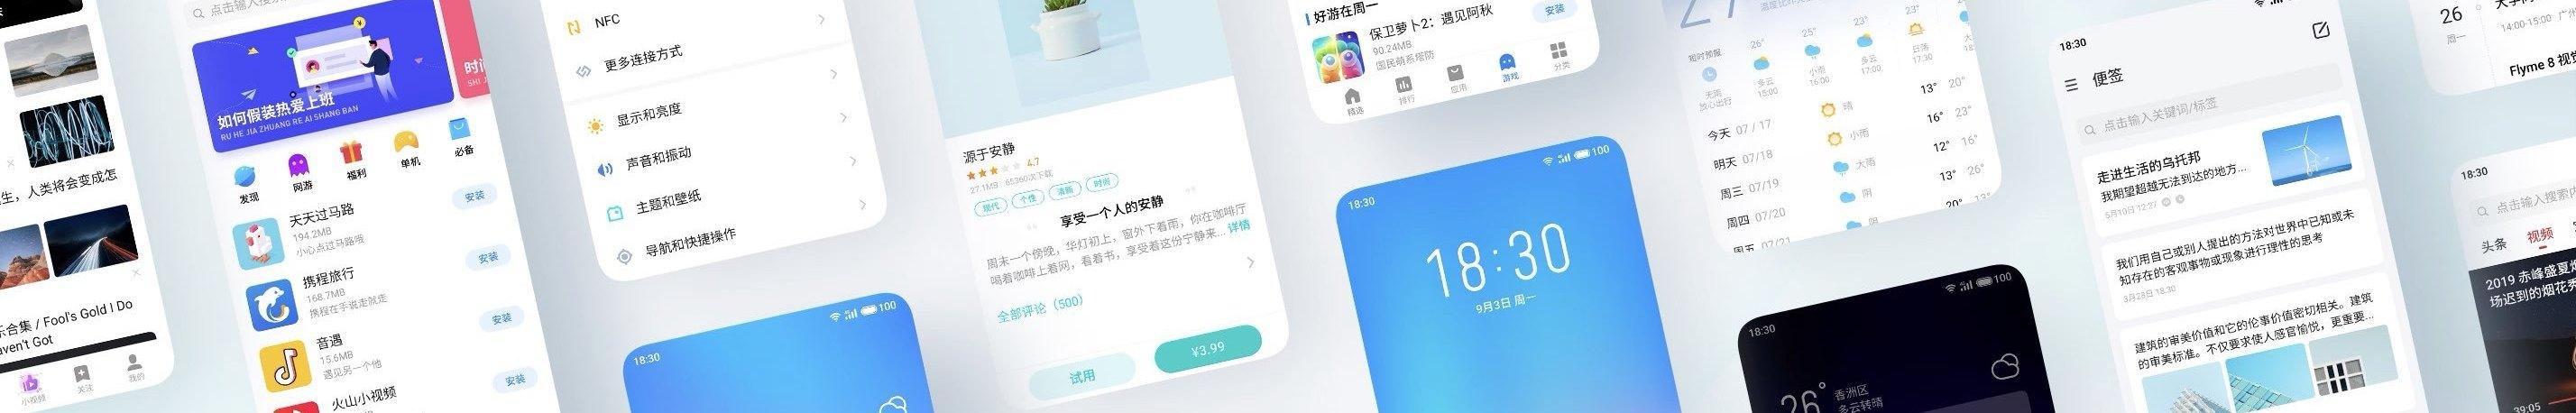 魅族科技官方 banner